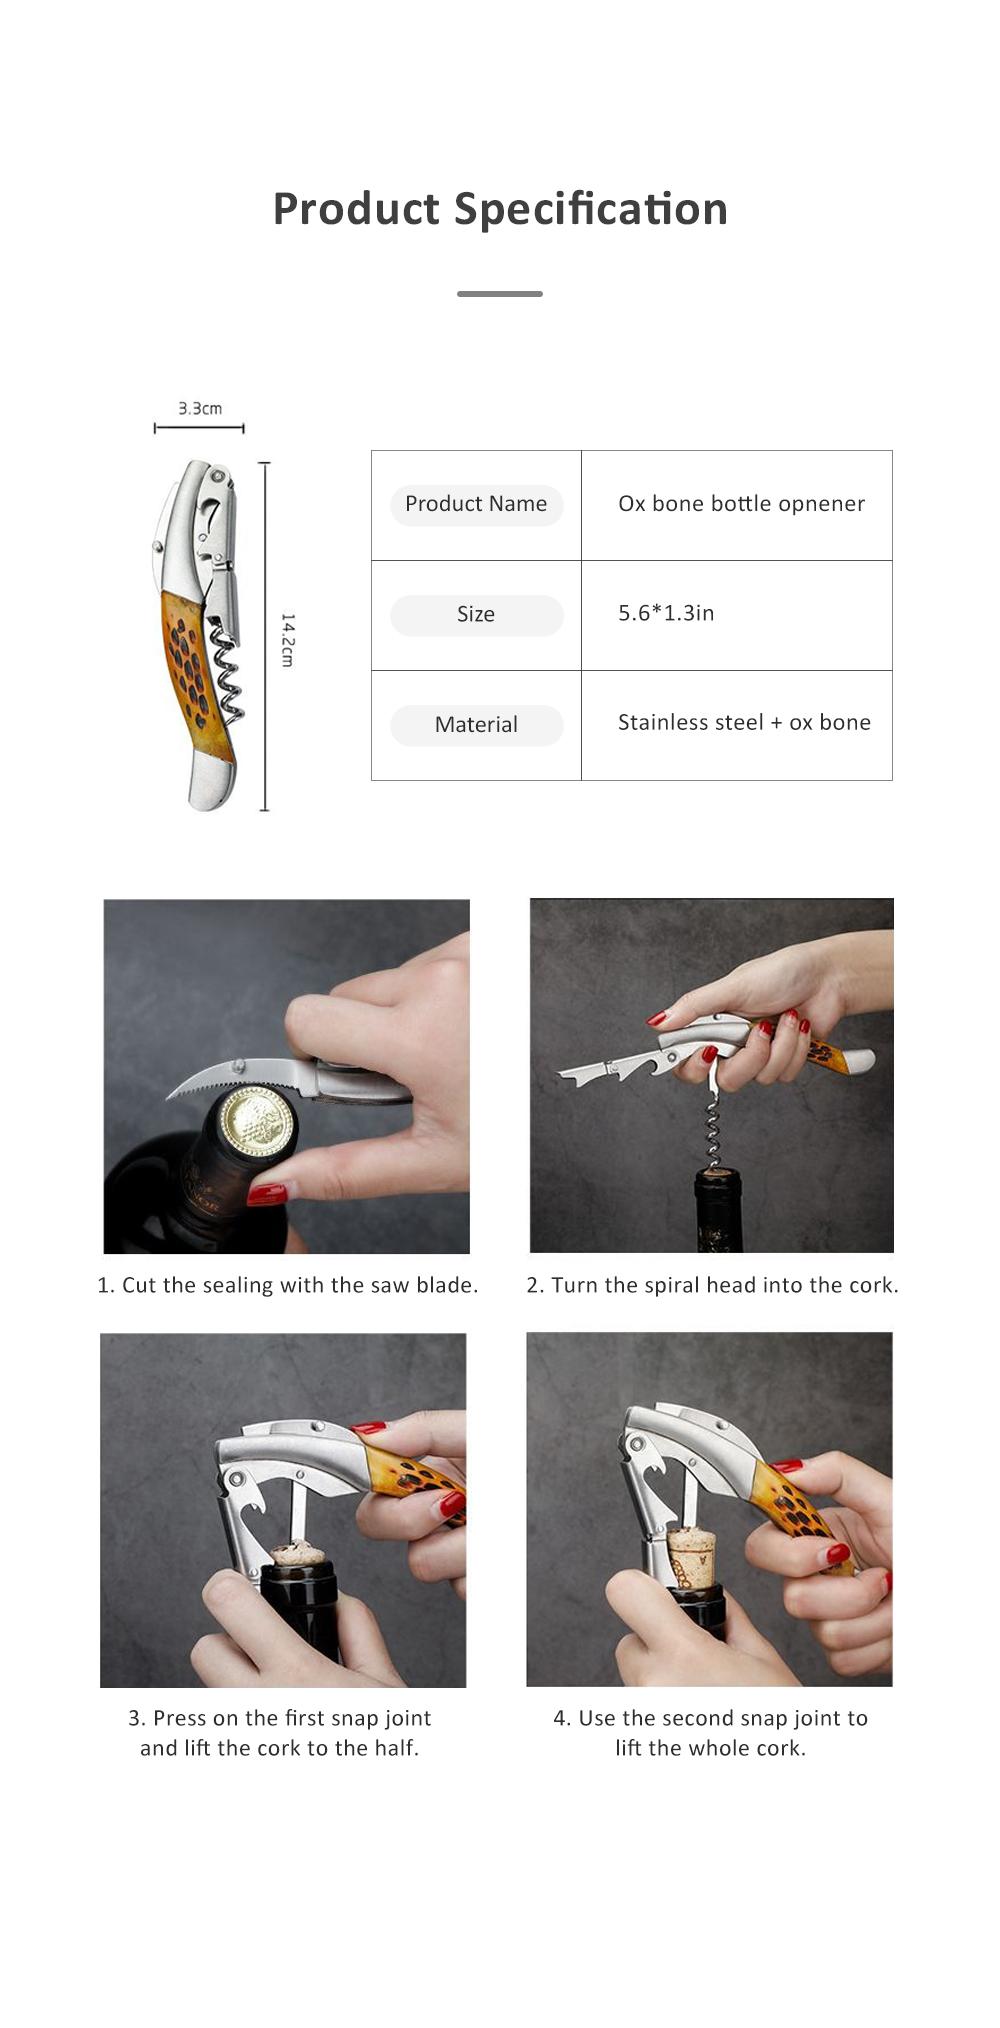 OX Bone Bottle Opener Stainless Steel Thickened Wine Bottle Opener with Little Knife 6